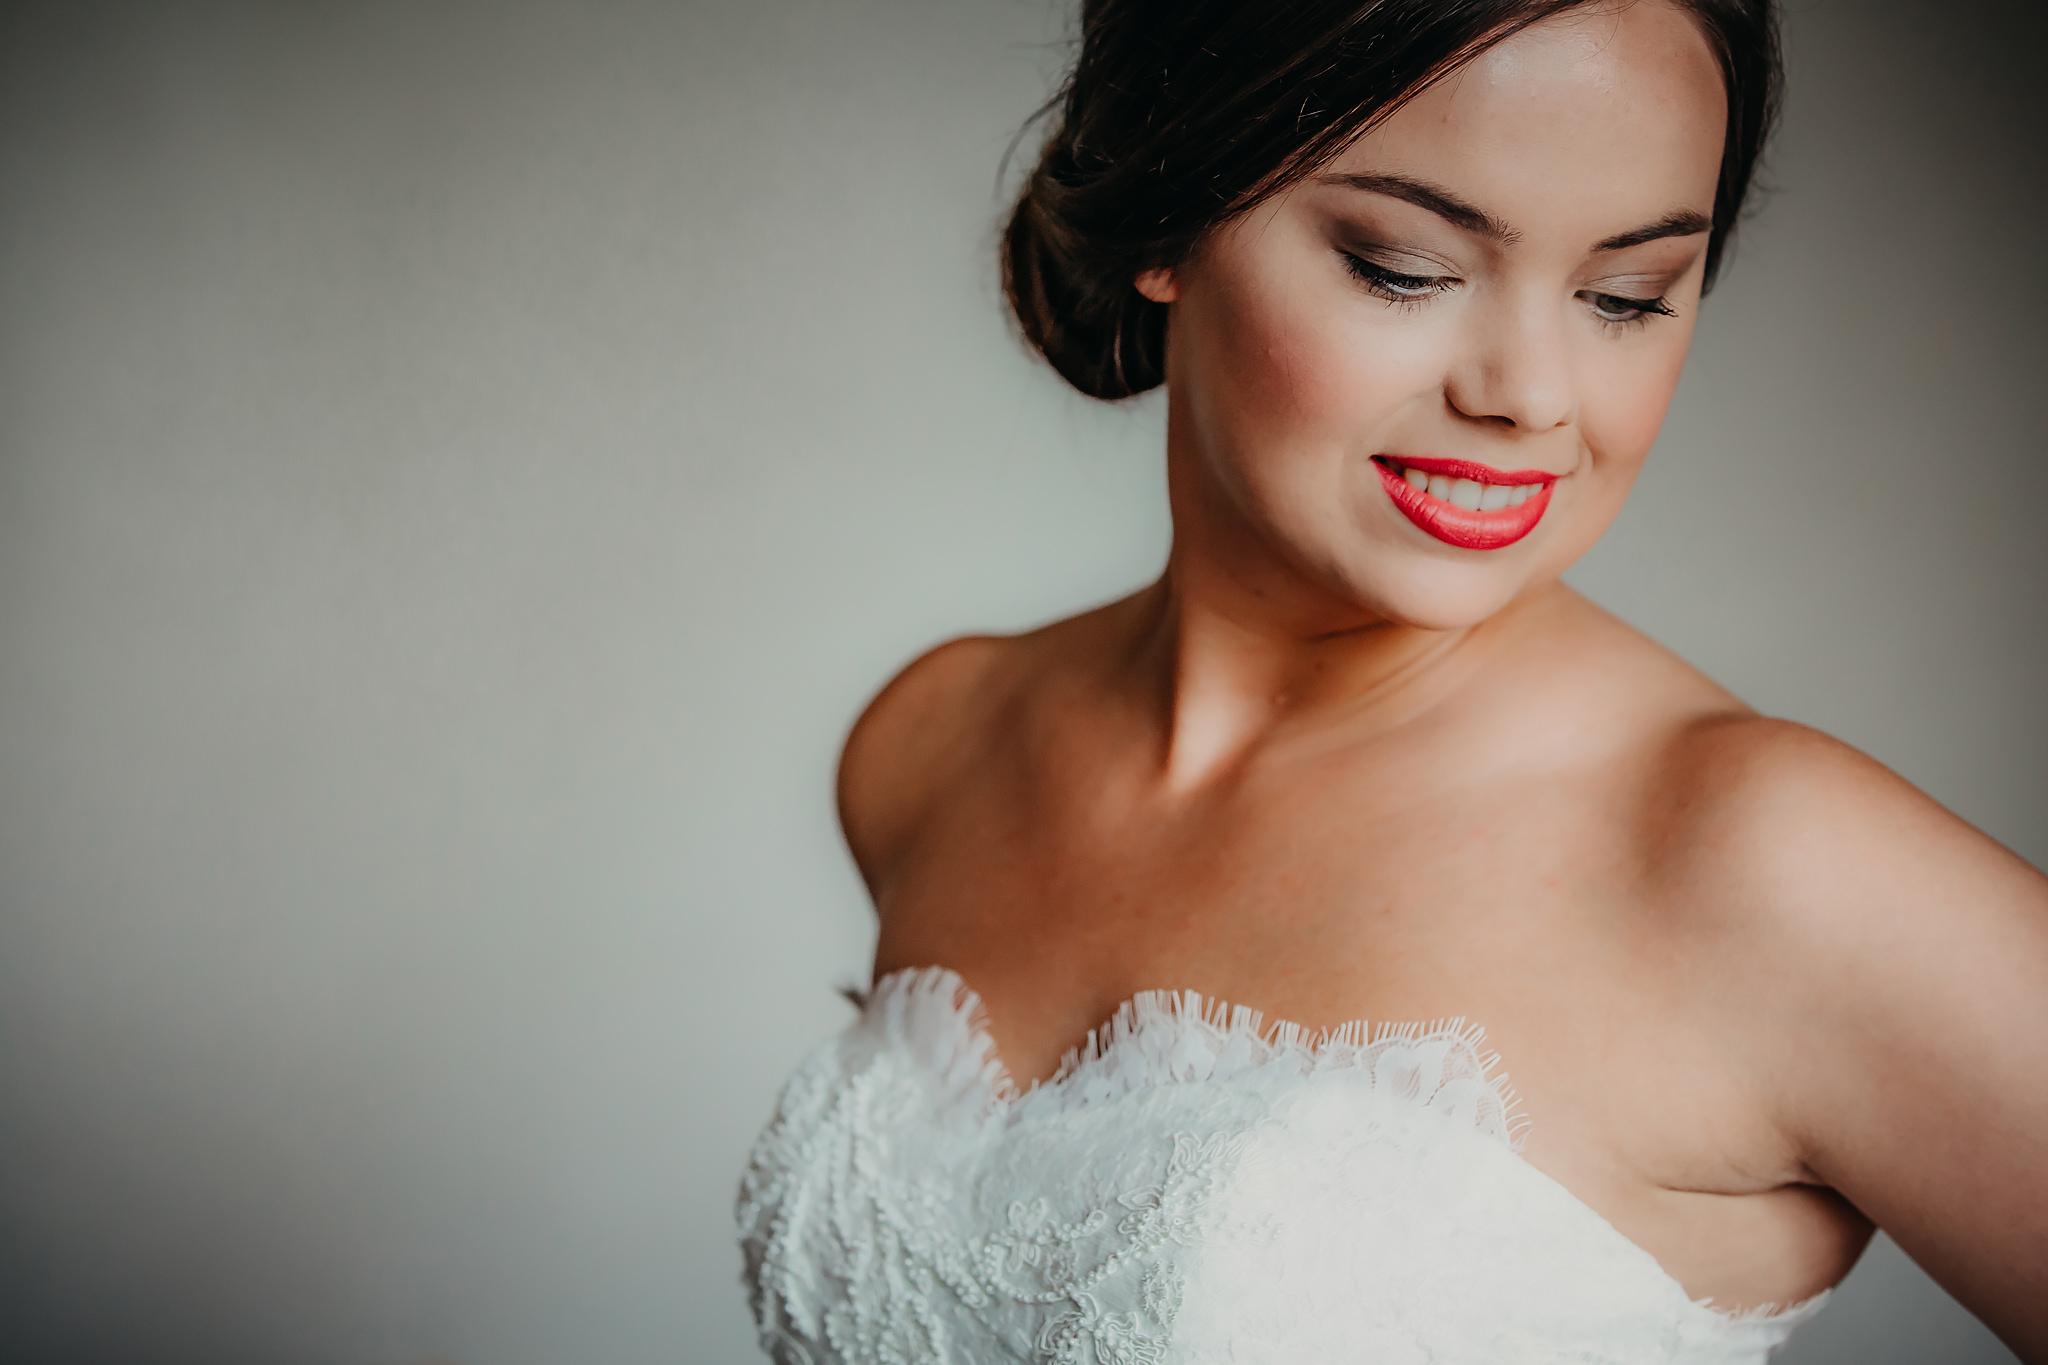 Bruidsreportage Bruidsfotografie Wedding Photographer 029 Bas Driessen Photography